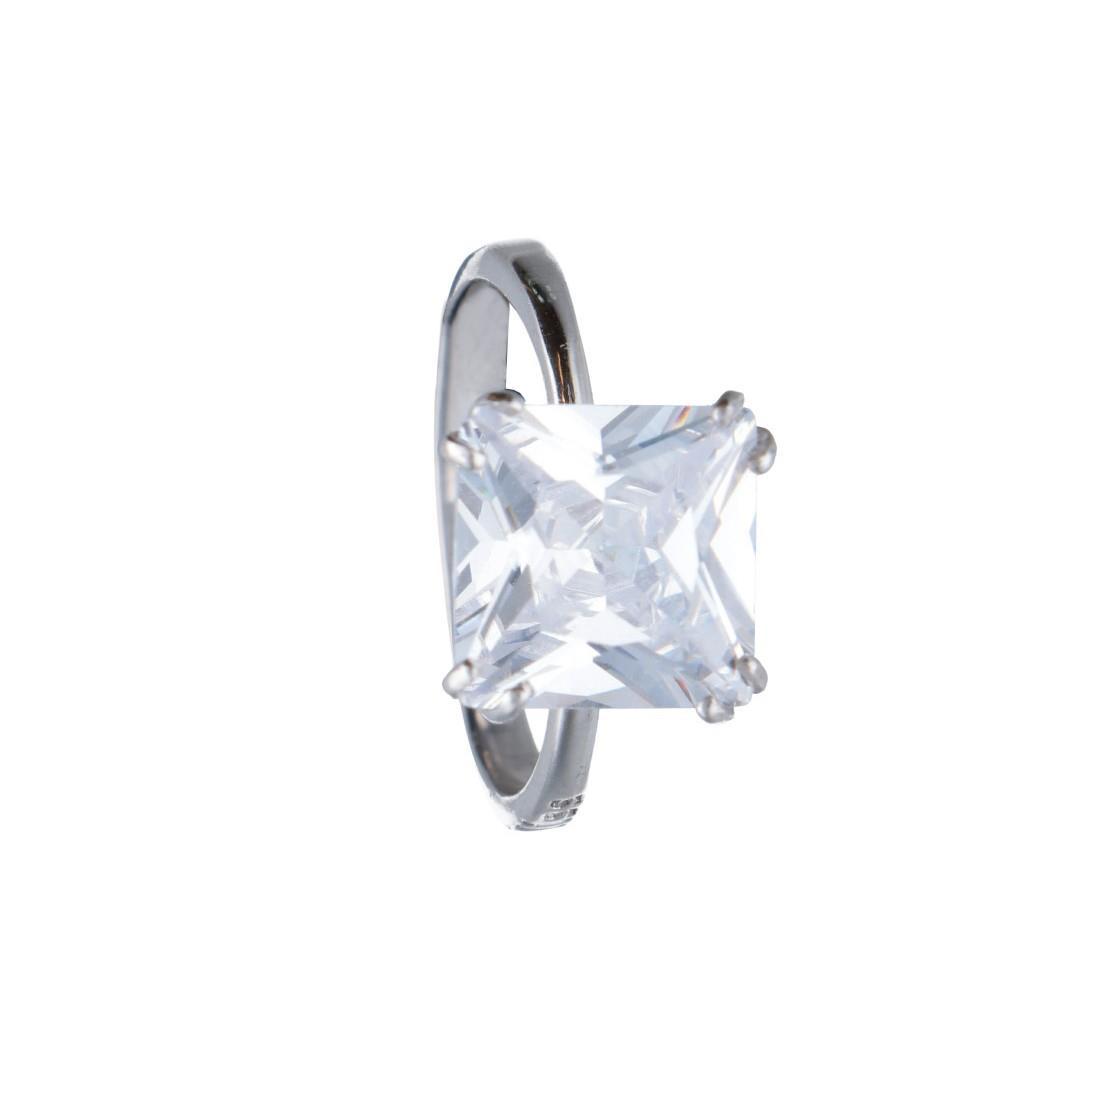 Anello in argento con zircone mis 15 - BLISS